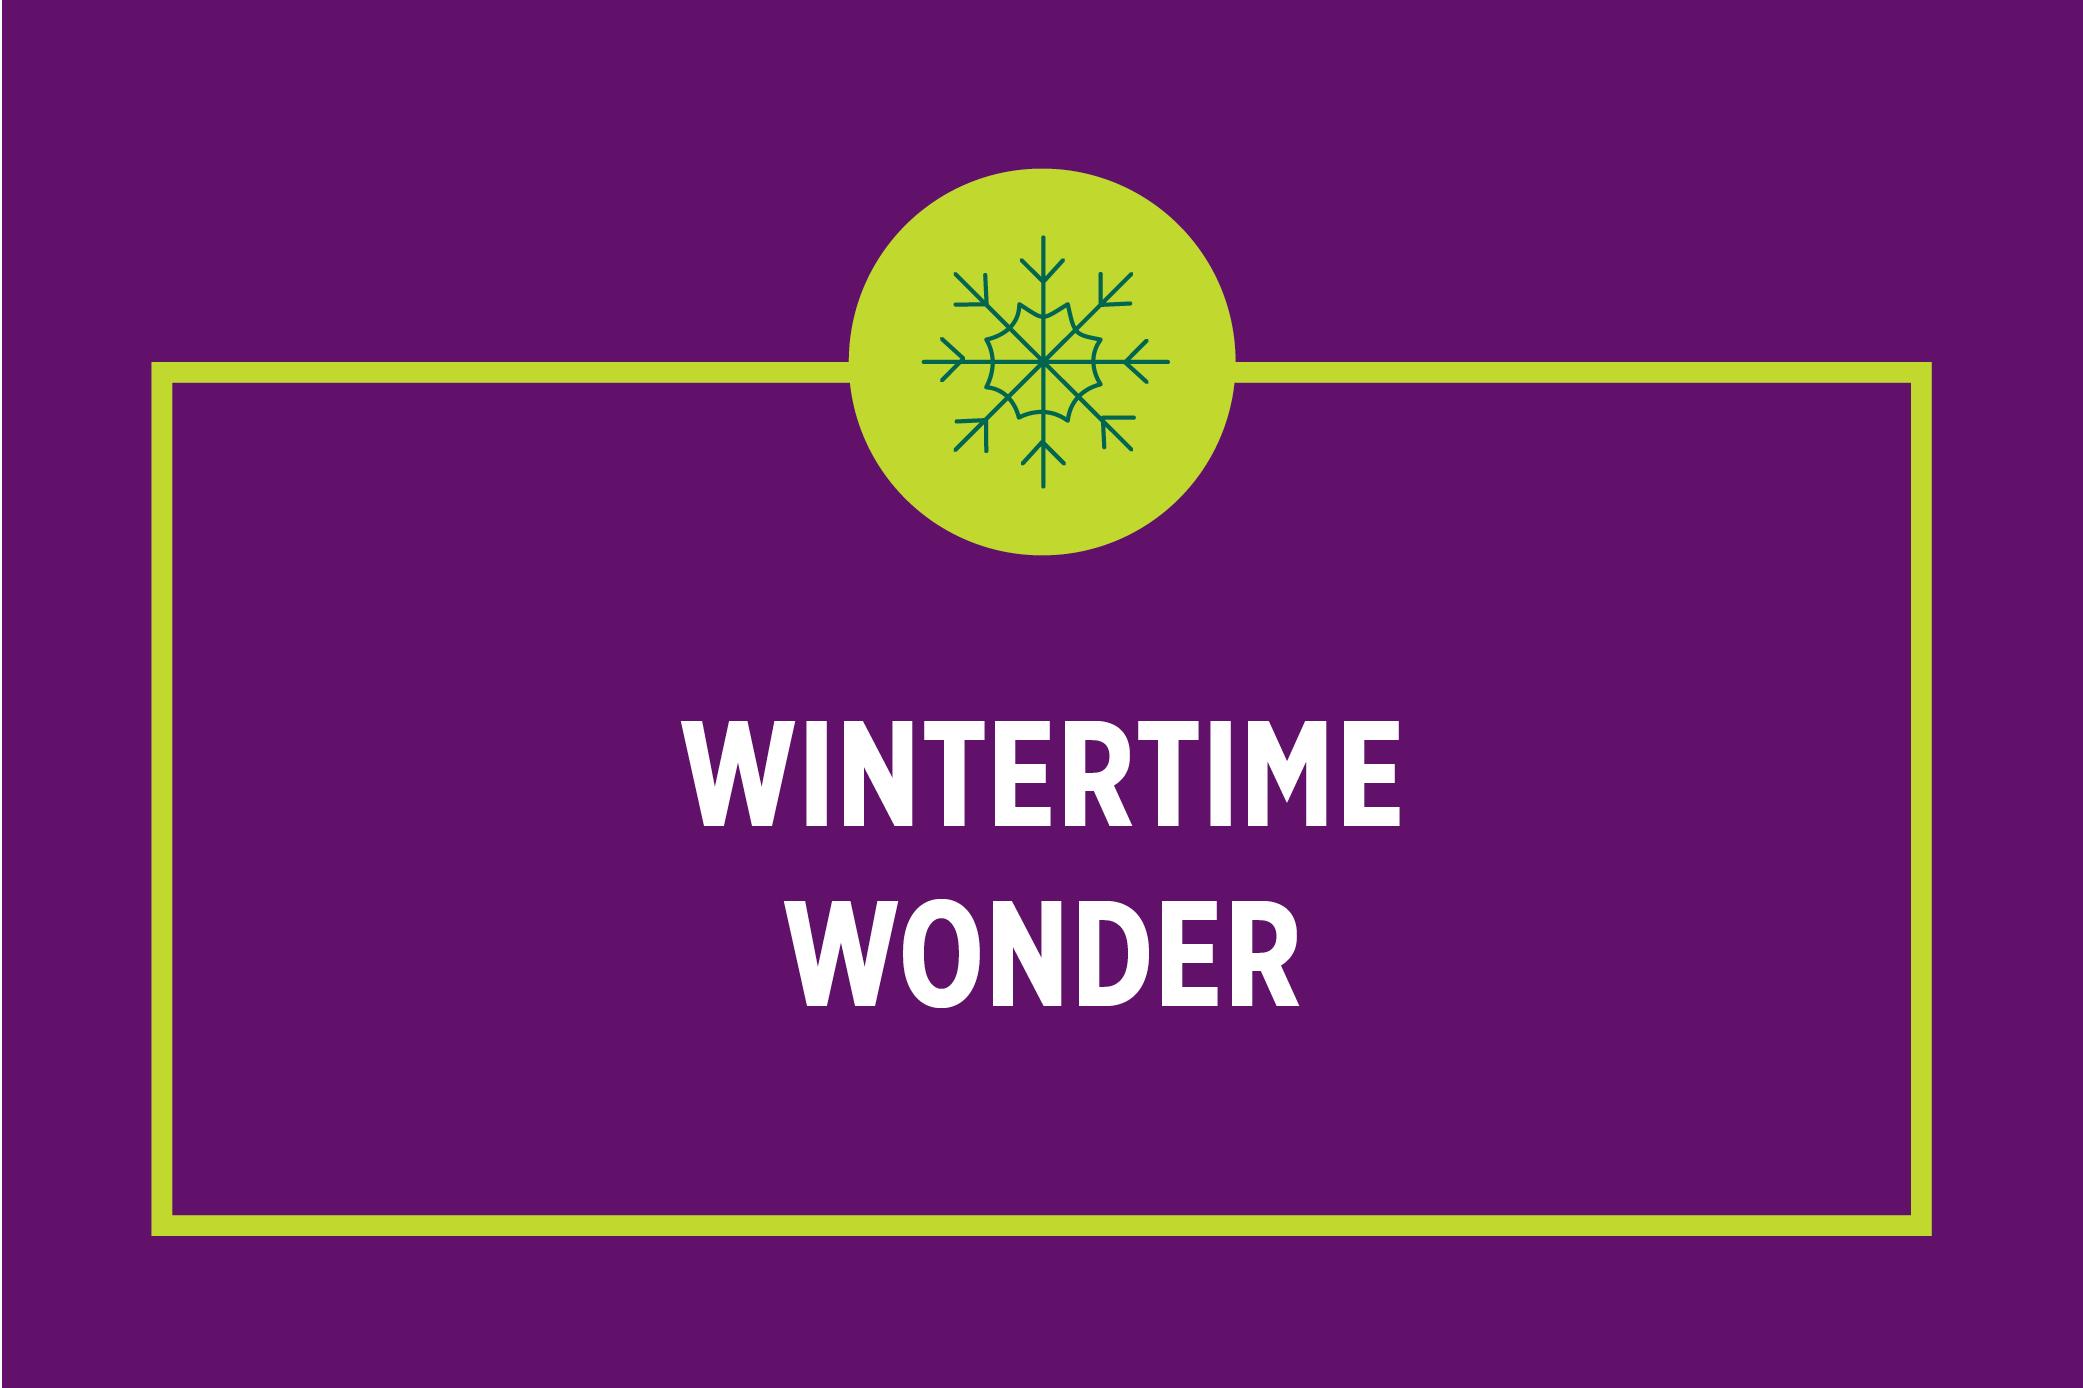 Wintertime Wonder